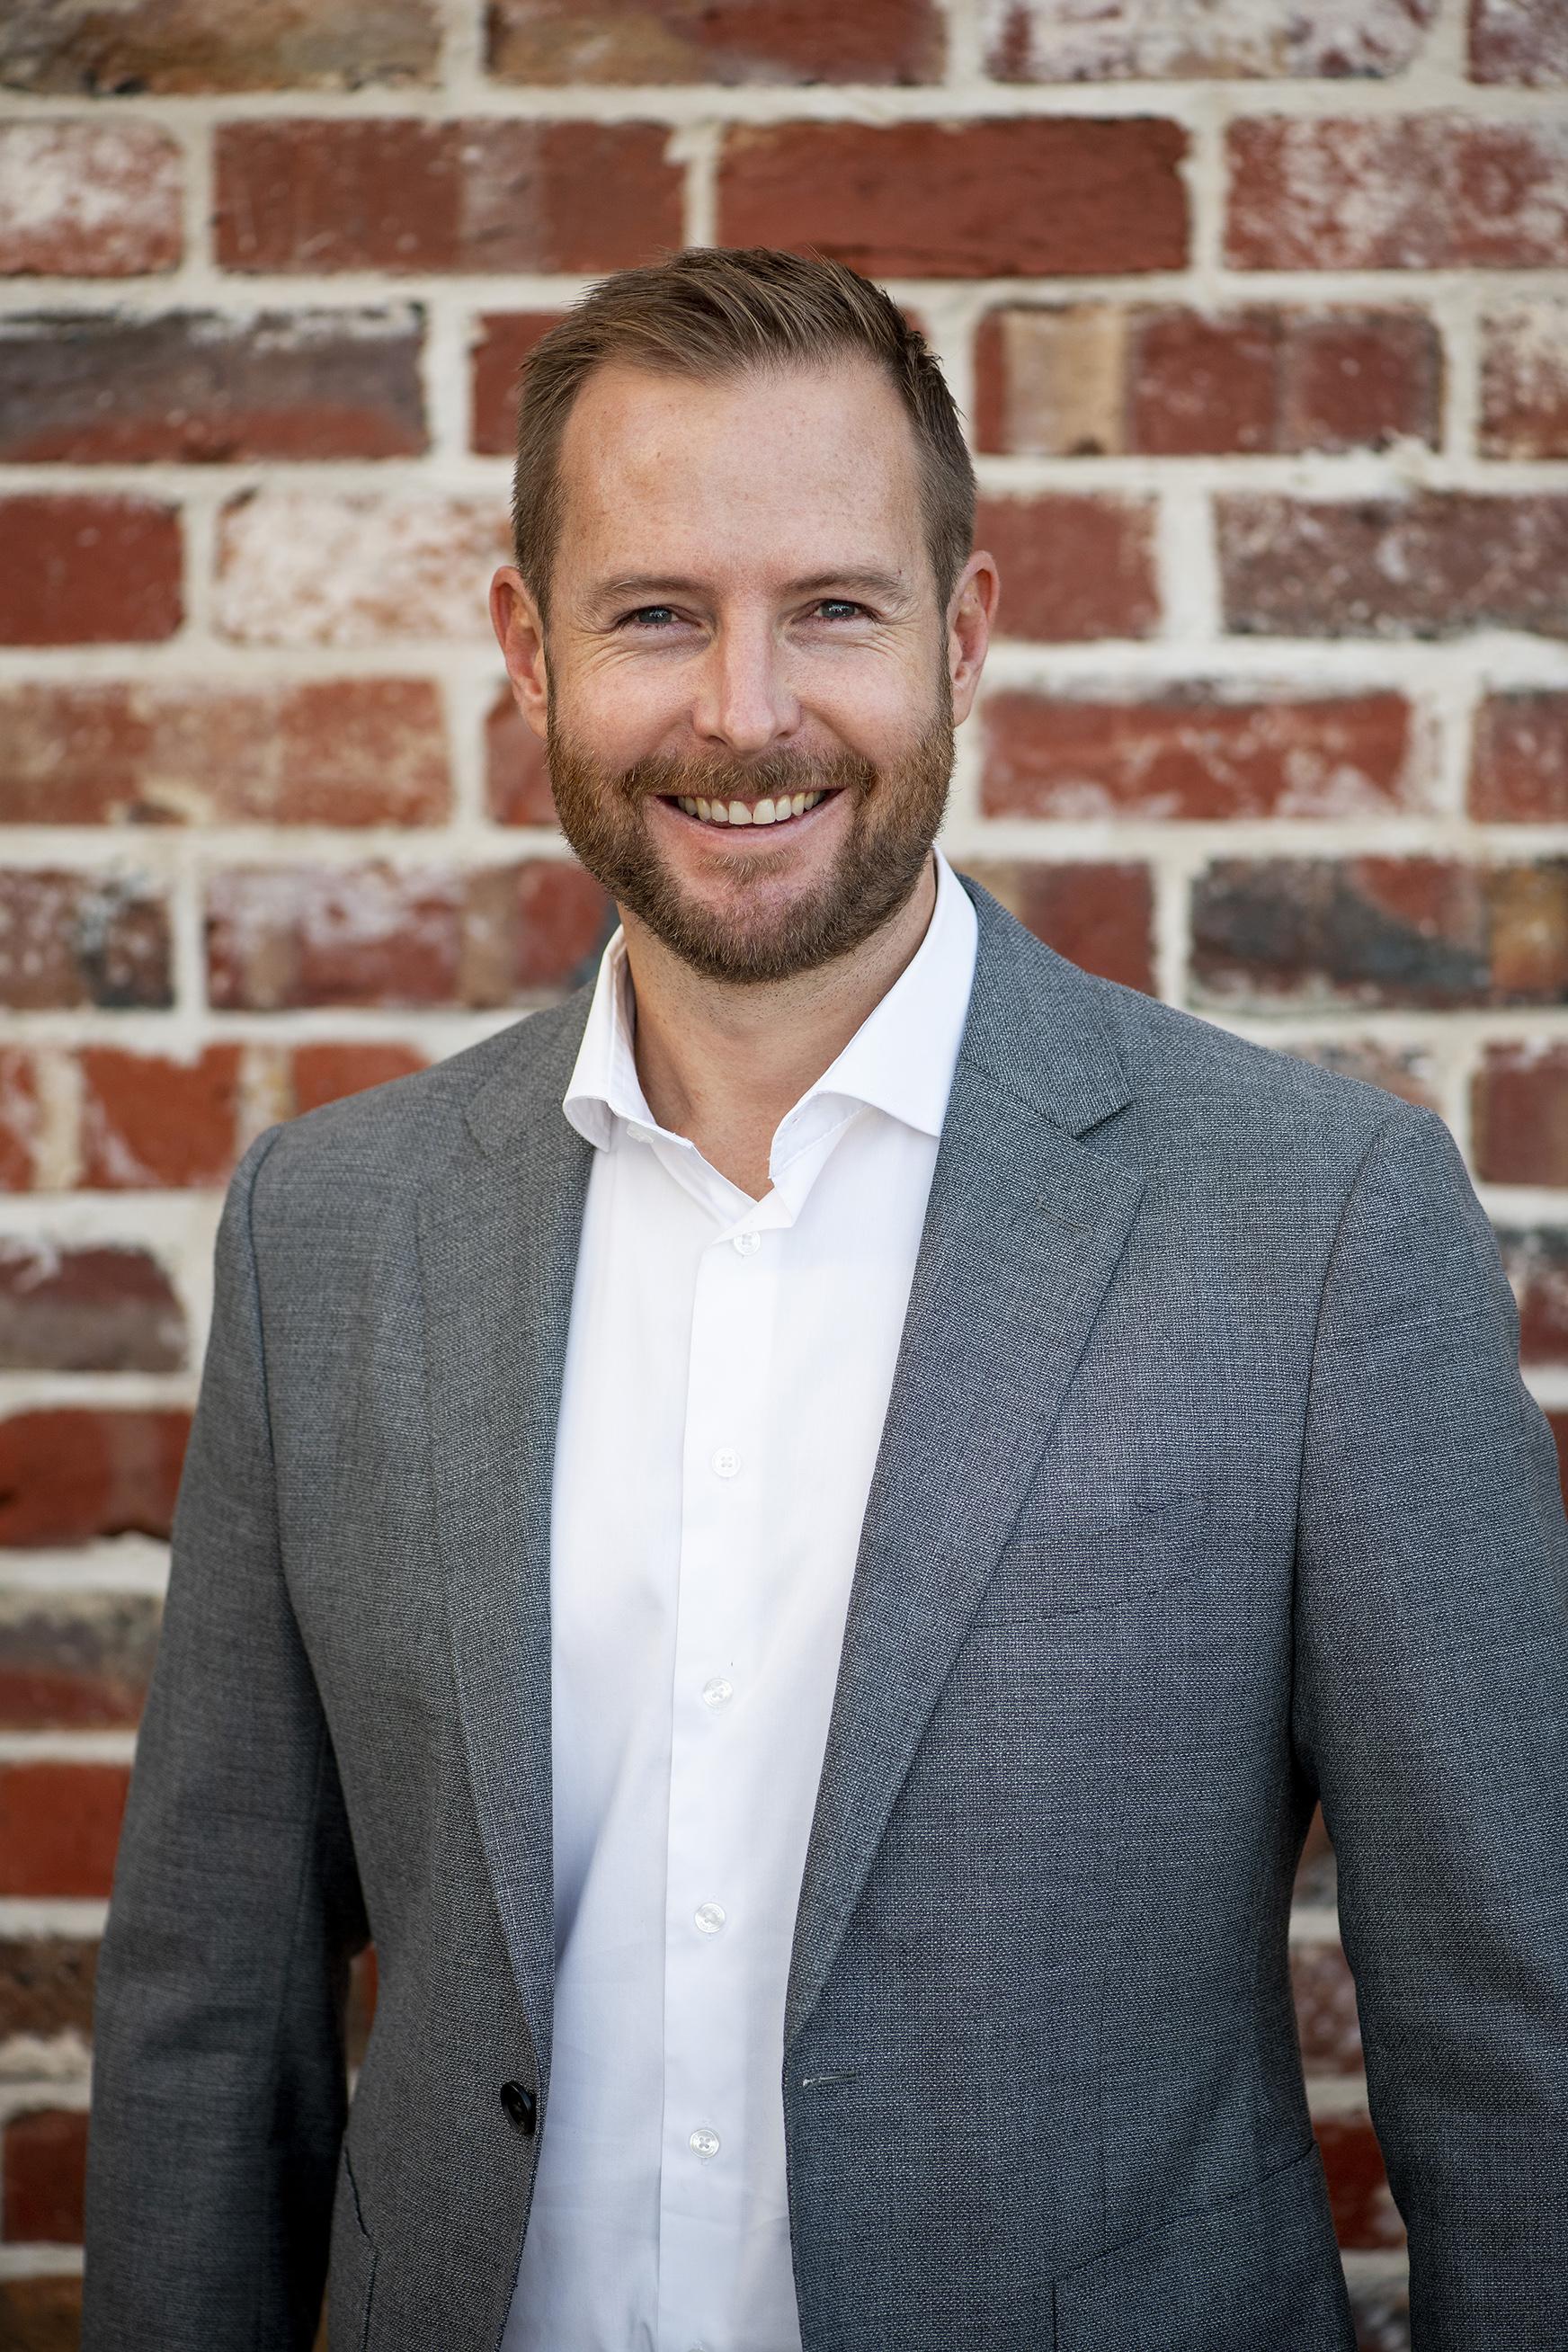 Brisbane Business Headshots